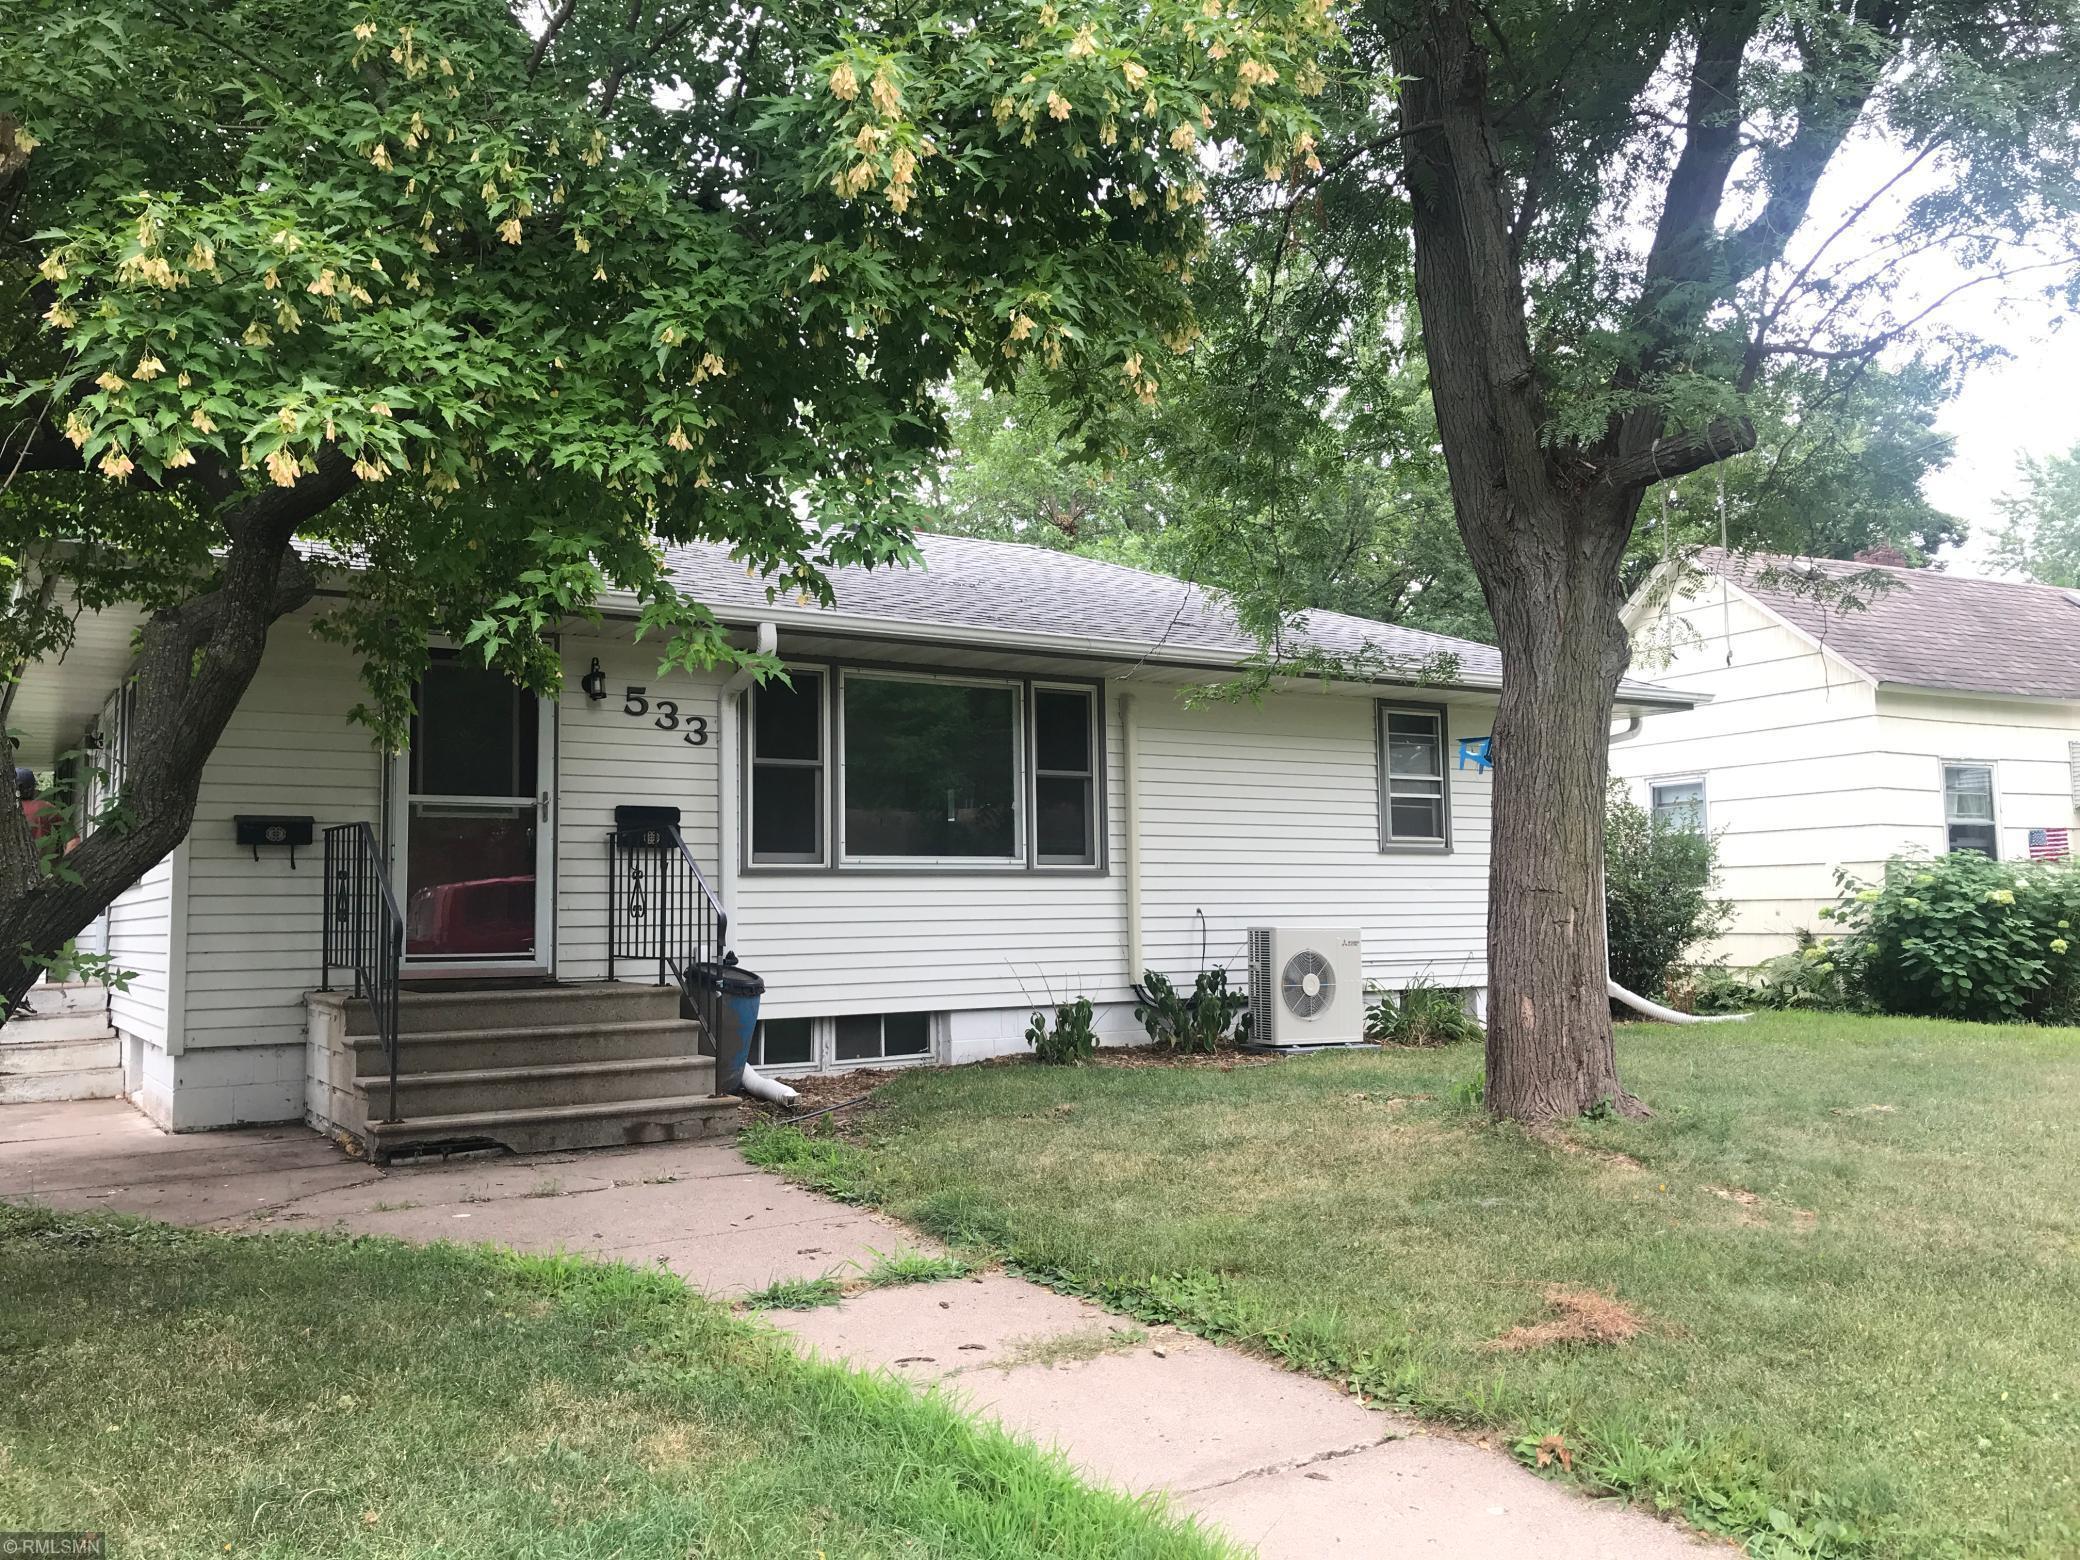 533 8th Street N Property Photo - Bayport, MN real estate listing